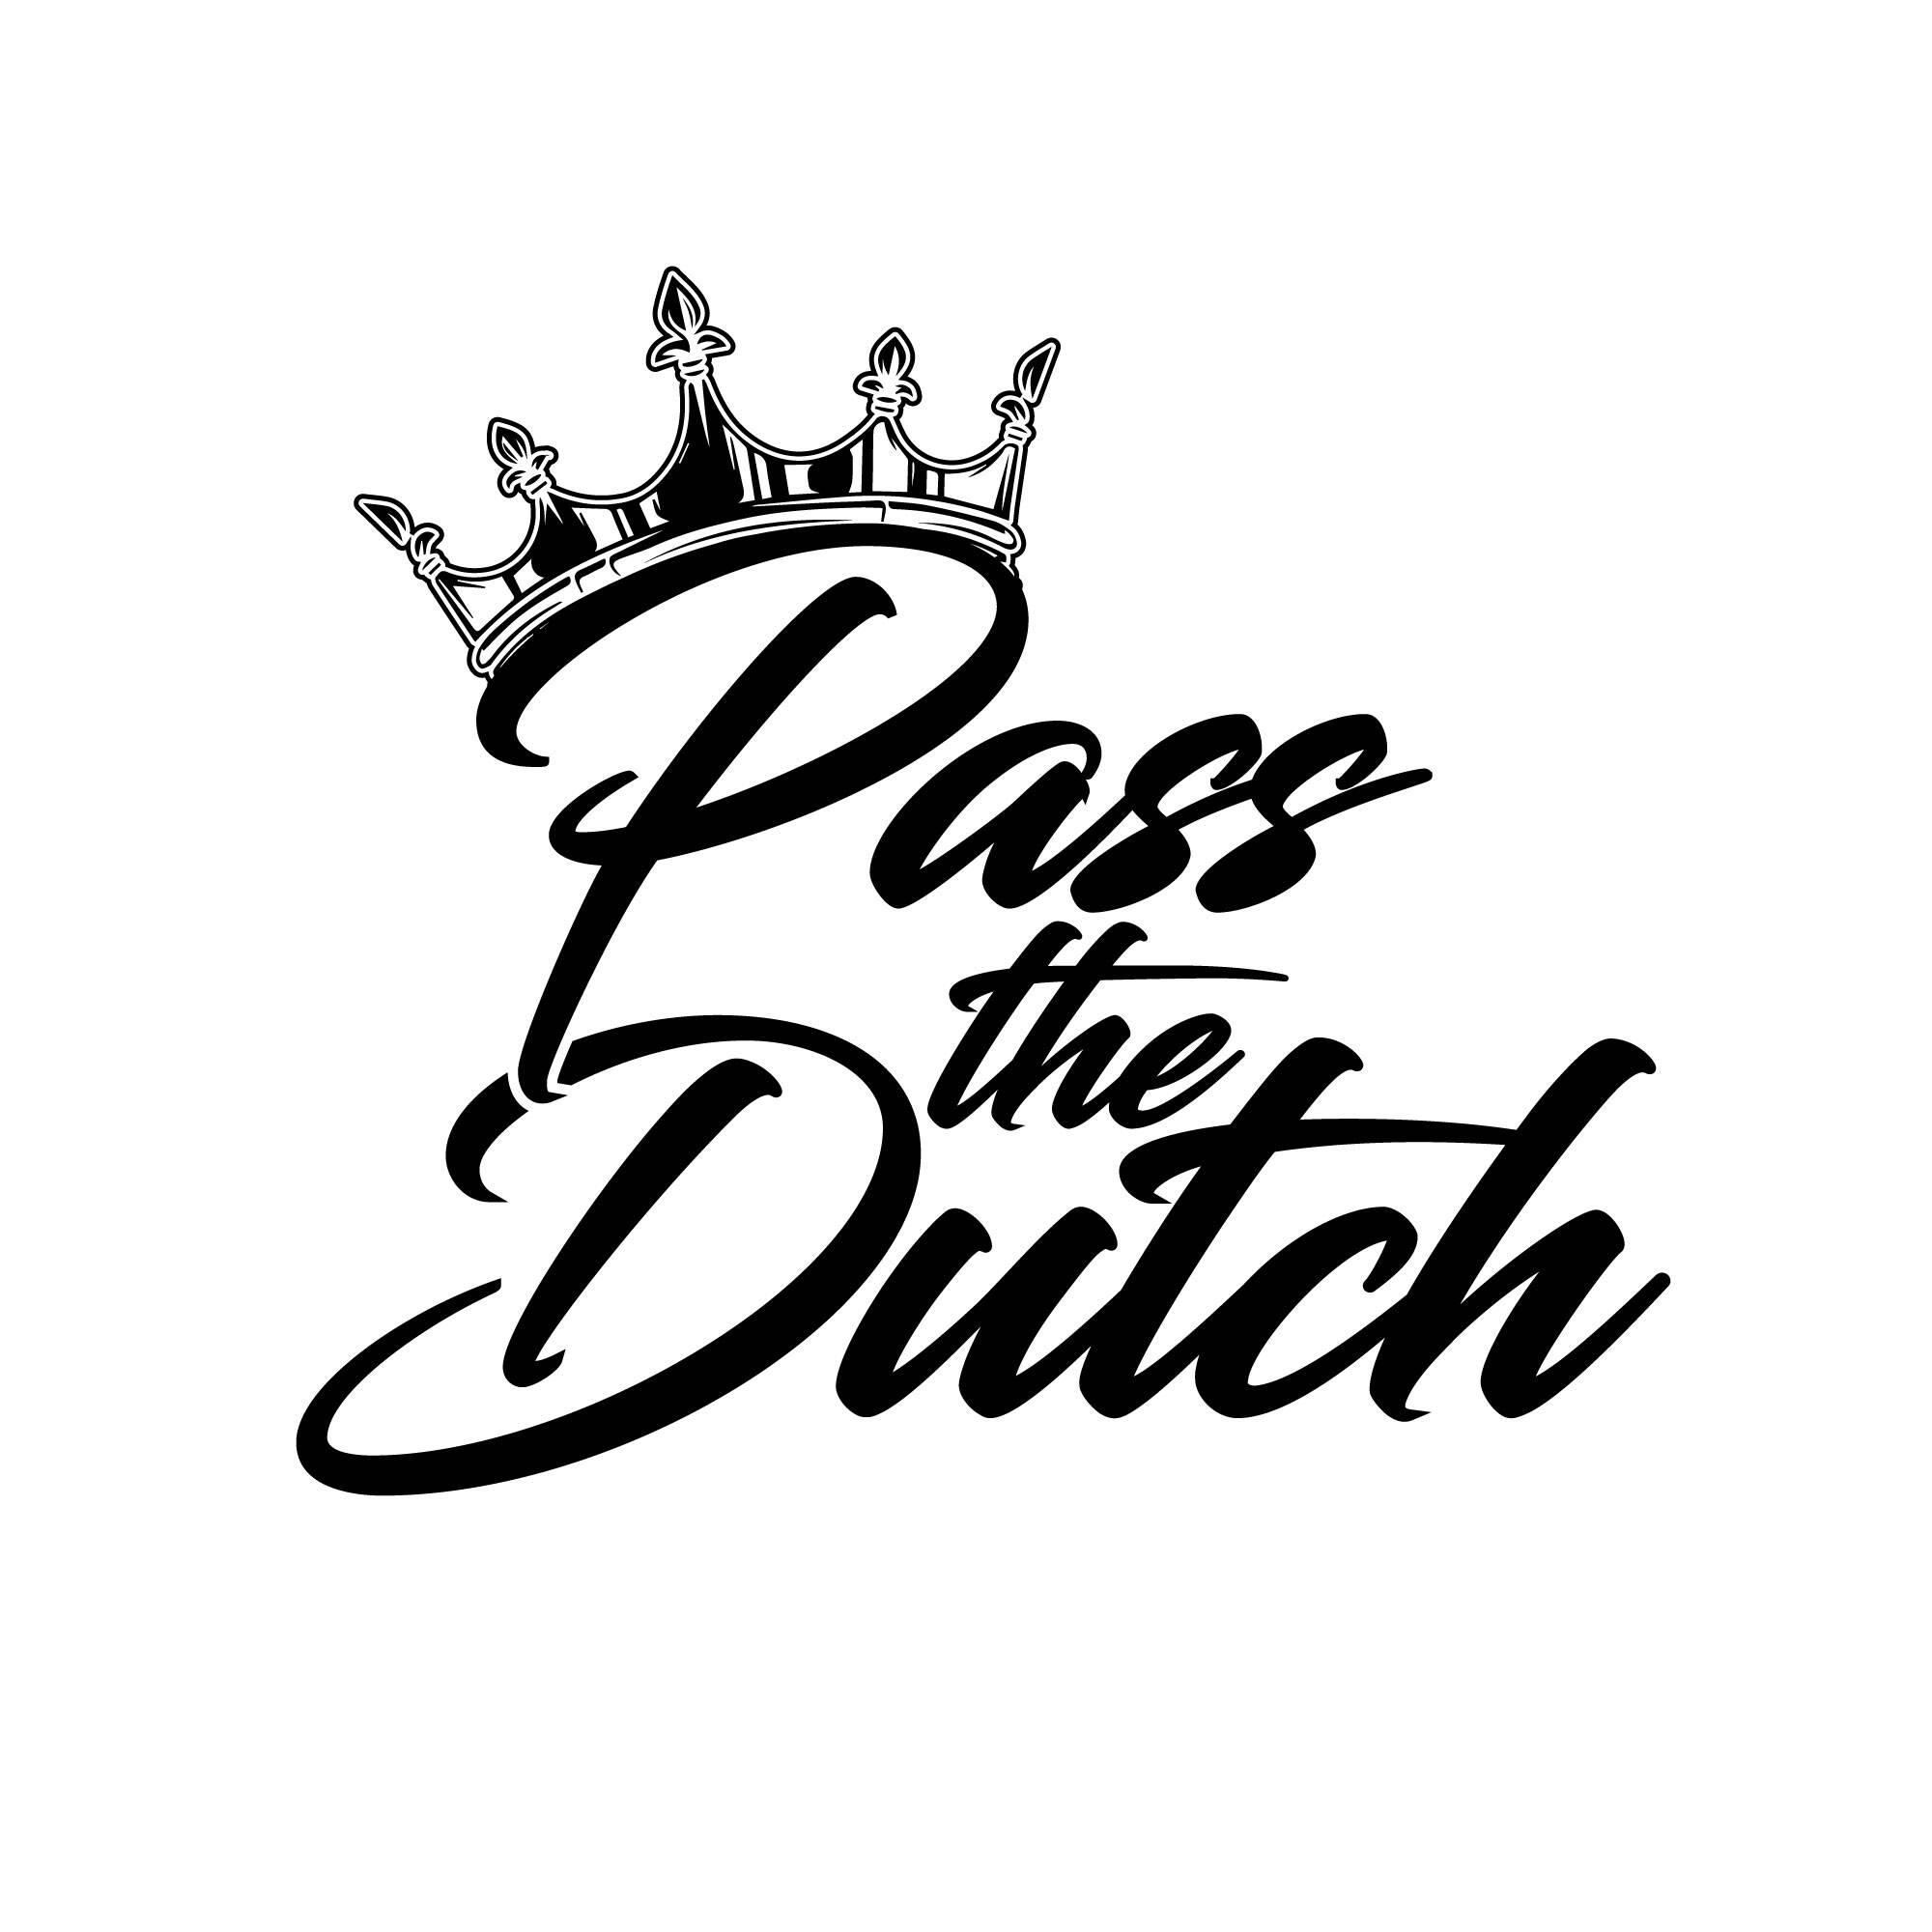 Pass-The-Dutch.jpg.4d02ef0beffedbb8cdbe43bf7c75749d.jpg